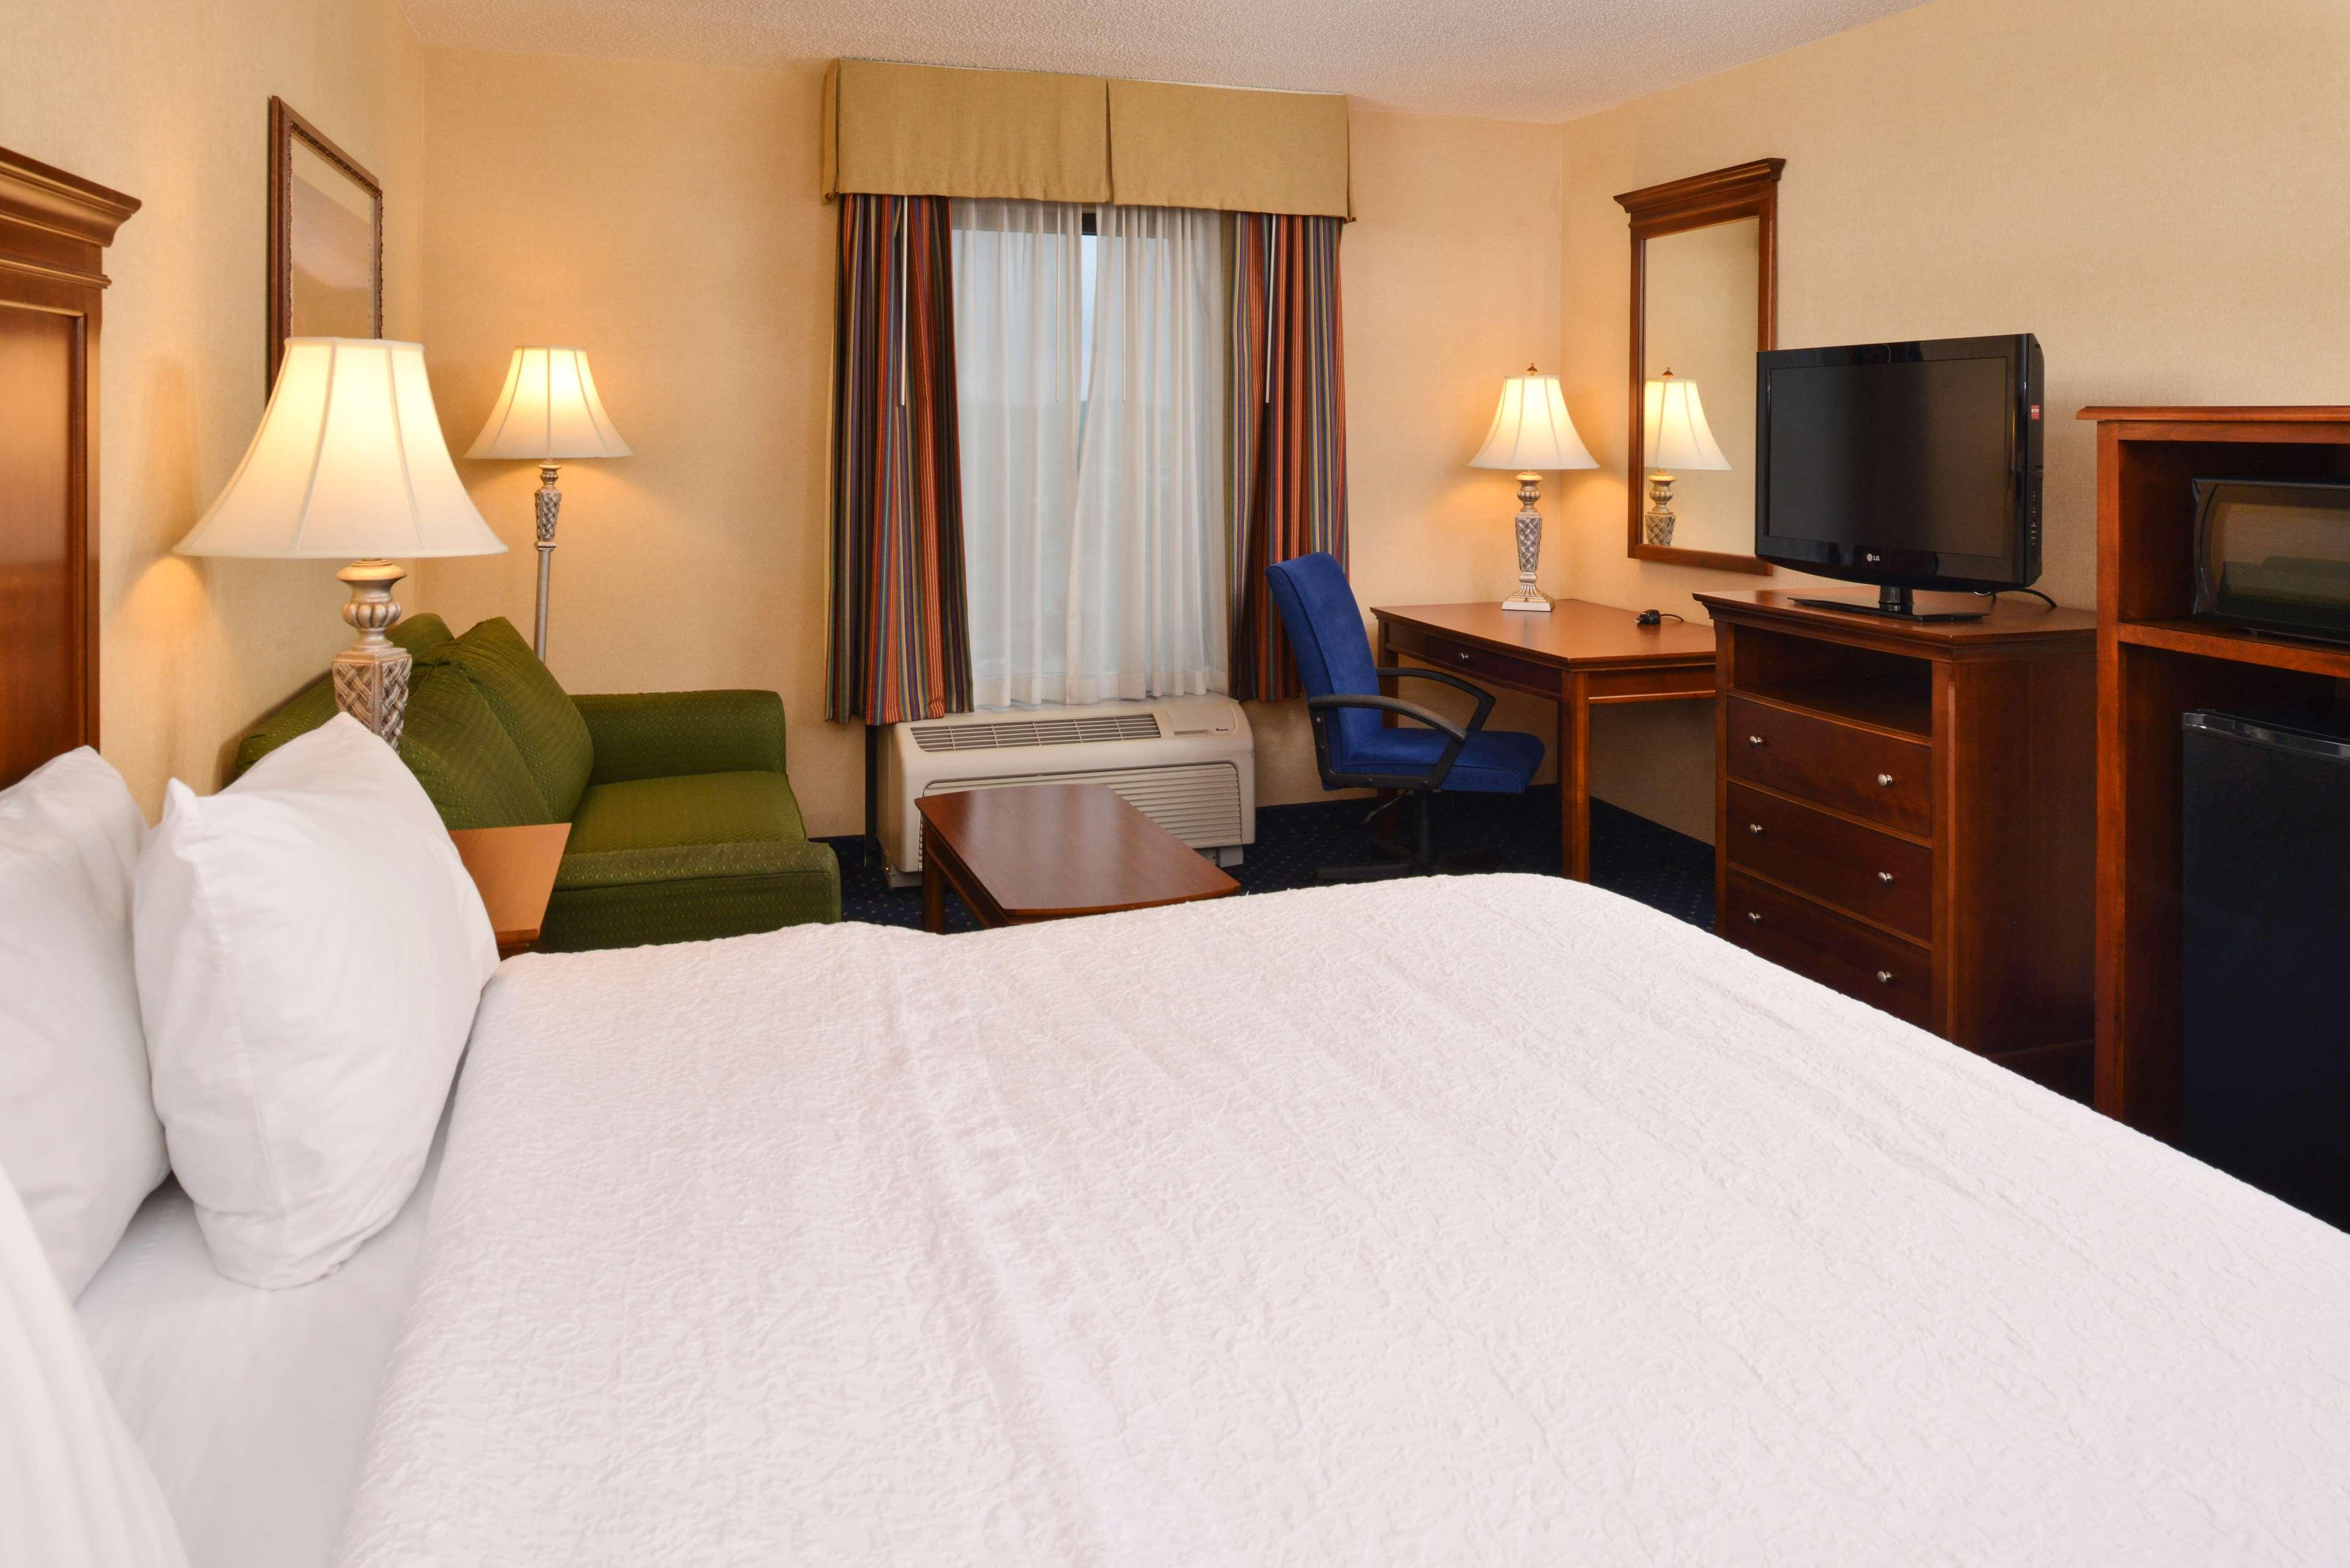 Hampton Inn & Suites Fredericksburg South image 24